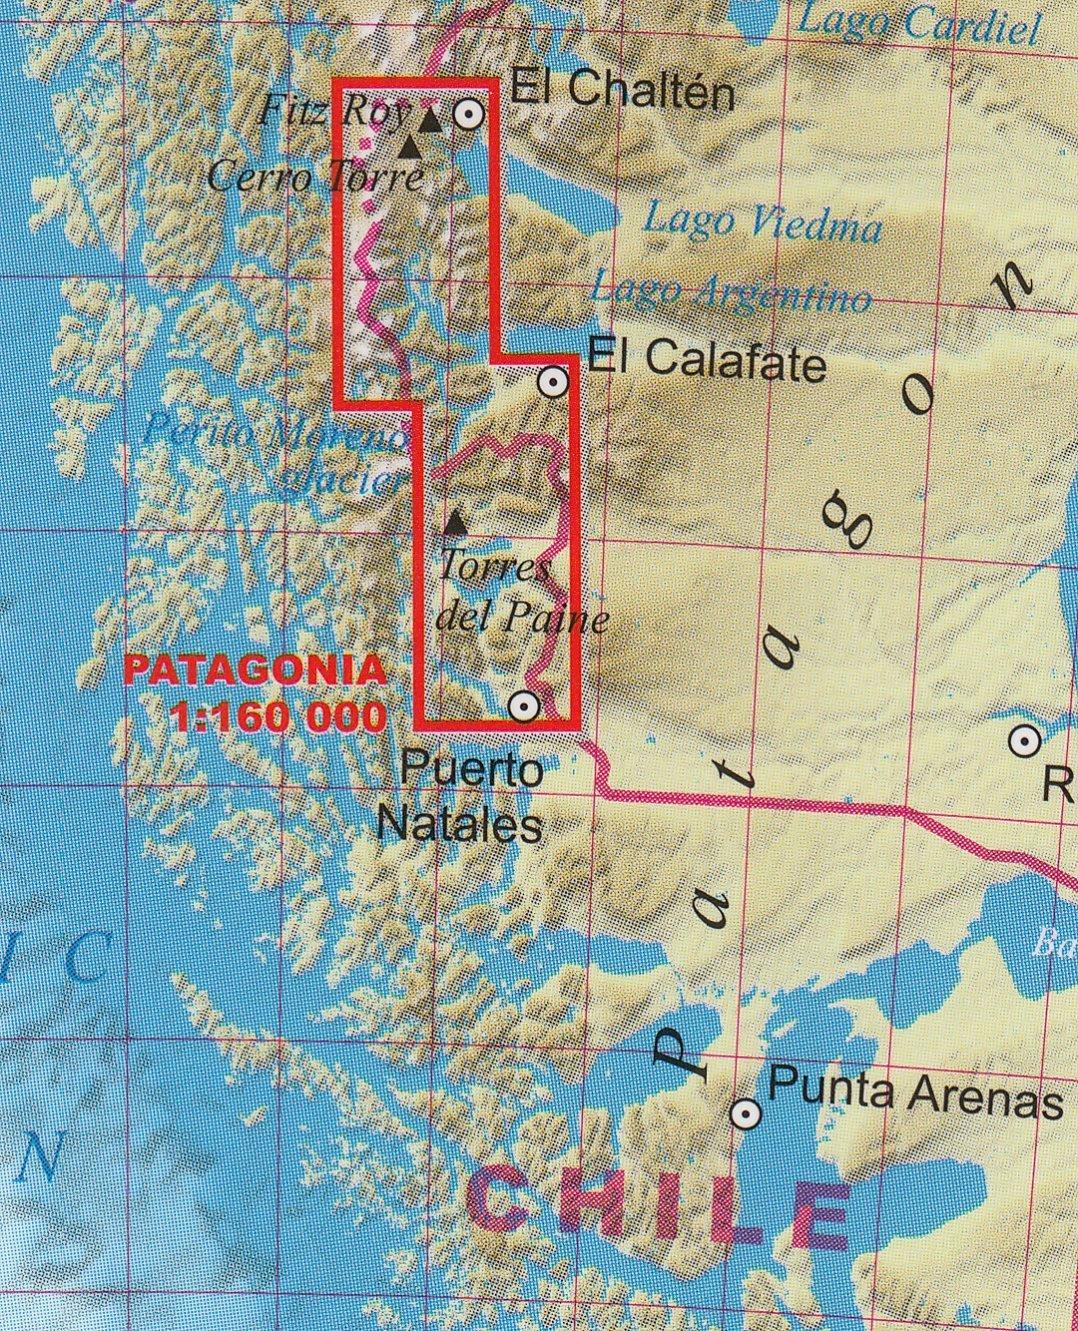 Patagonia Cartina Geografica.Amazon It Patagonia Trekking Mappa Topografica 1 160 000 Fitz Roy Cerro Torre Perito Moreni Glacier Torres Del Paine Terraquest Editions Libri